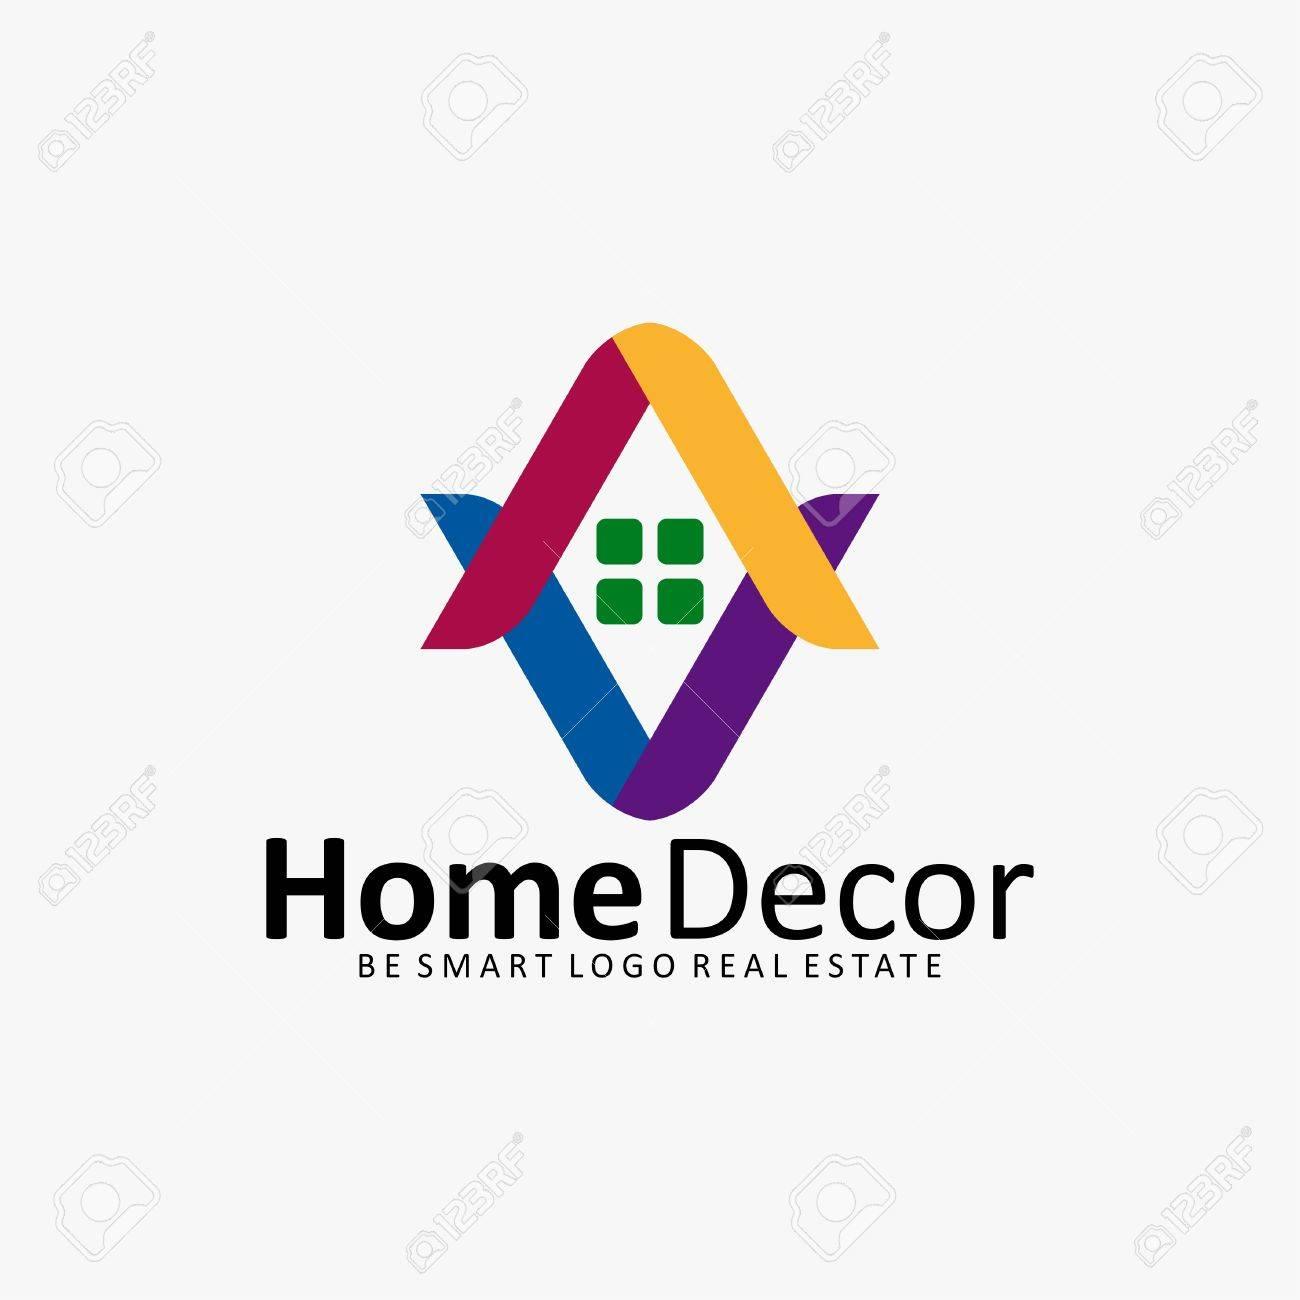 Home Decor House Real Estate Icon Logo Royalty Free Cliparts